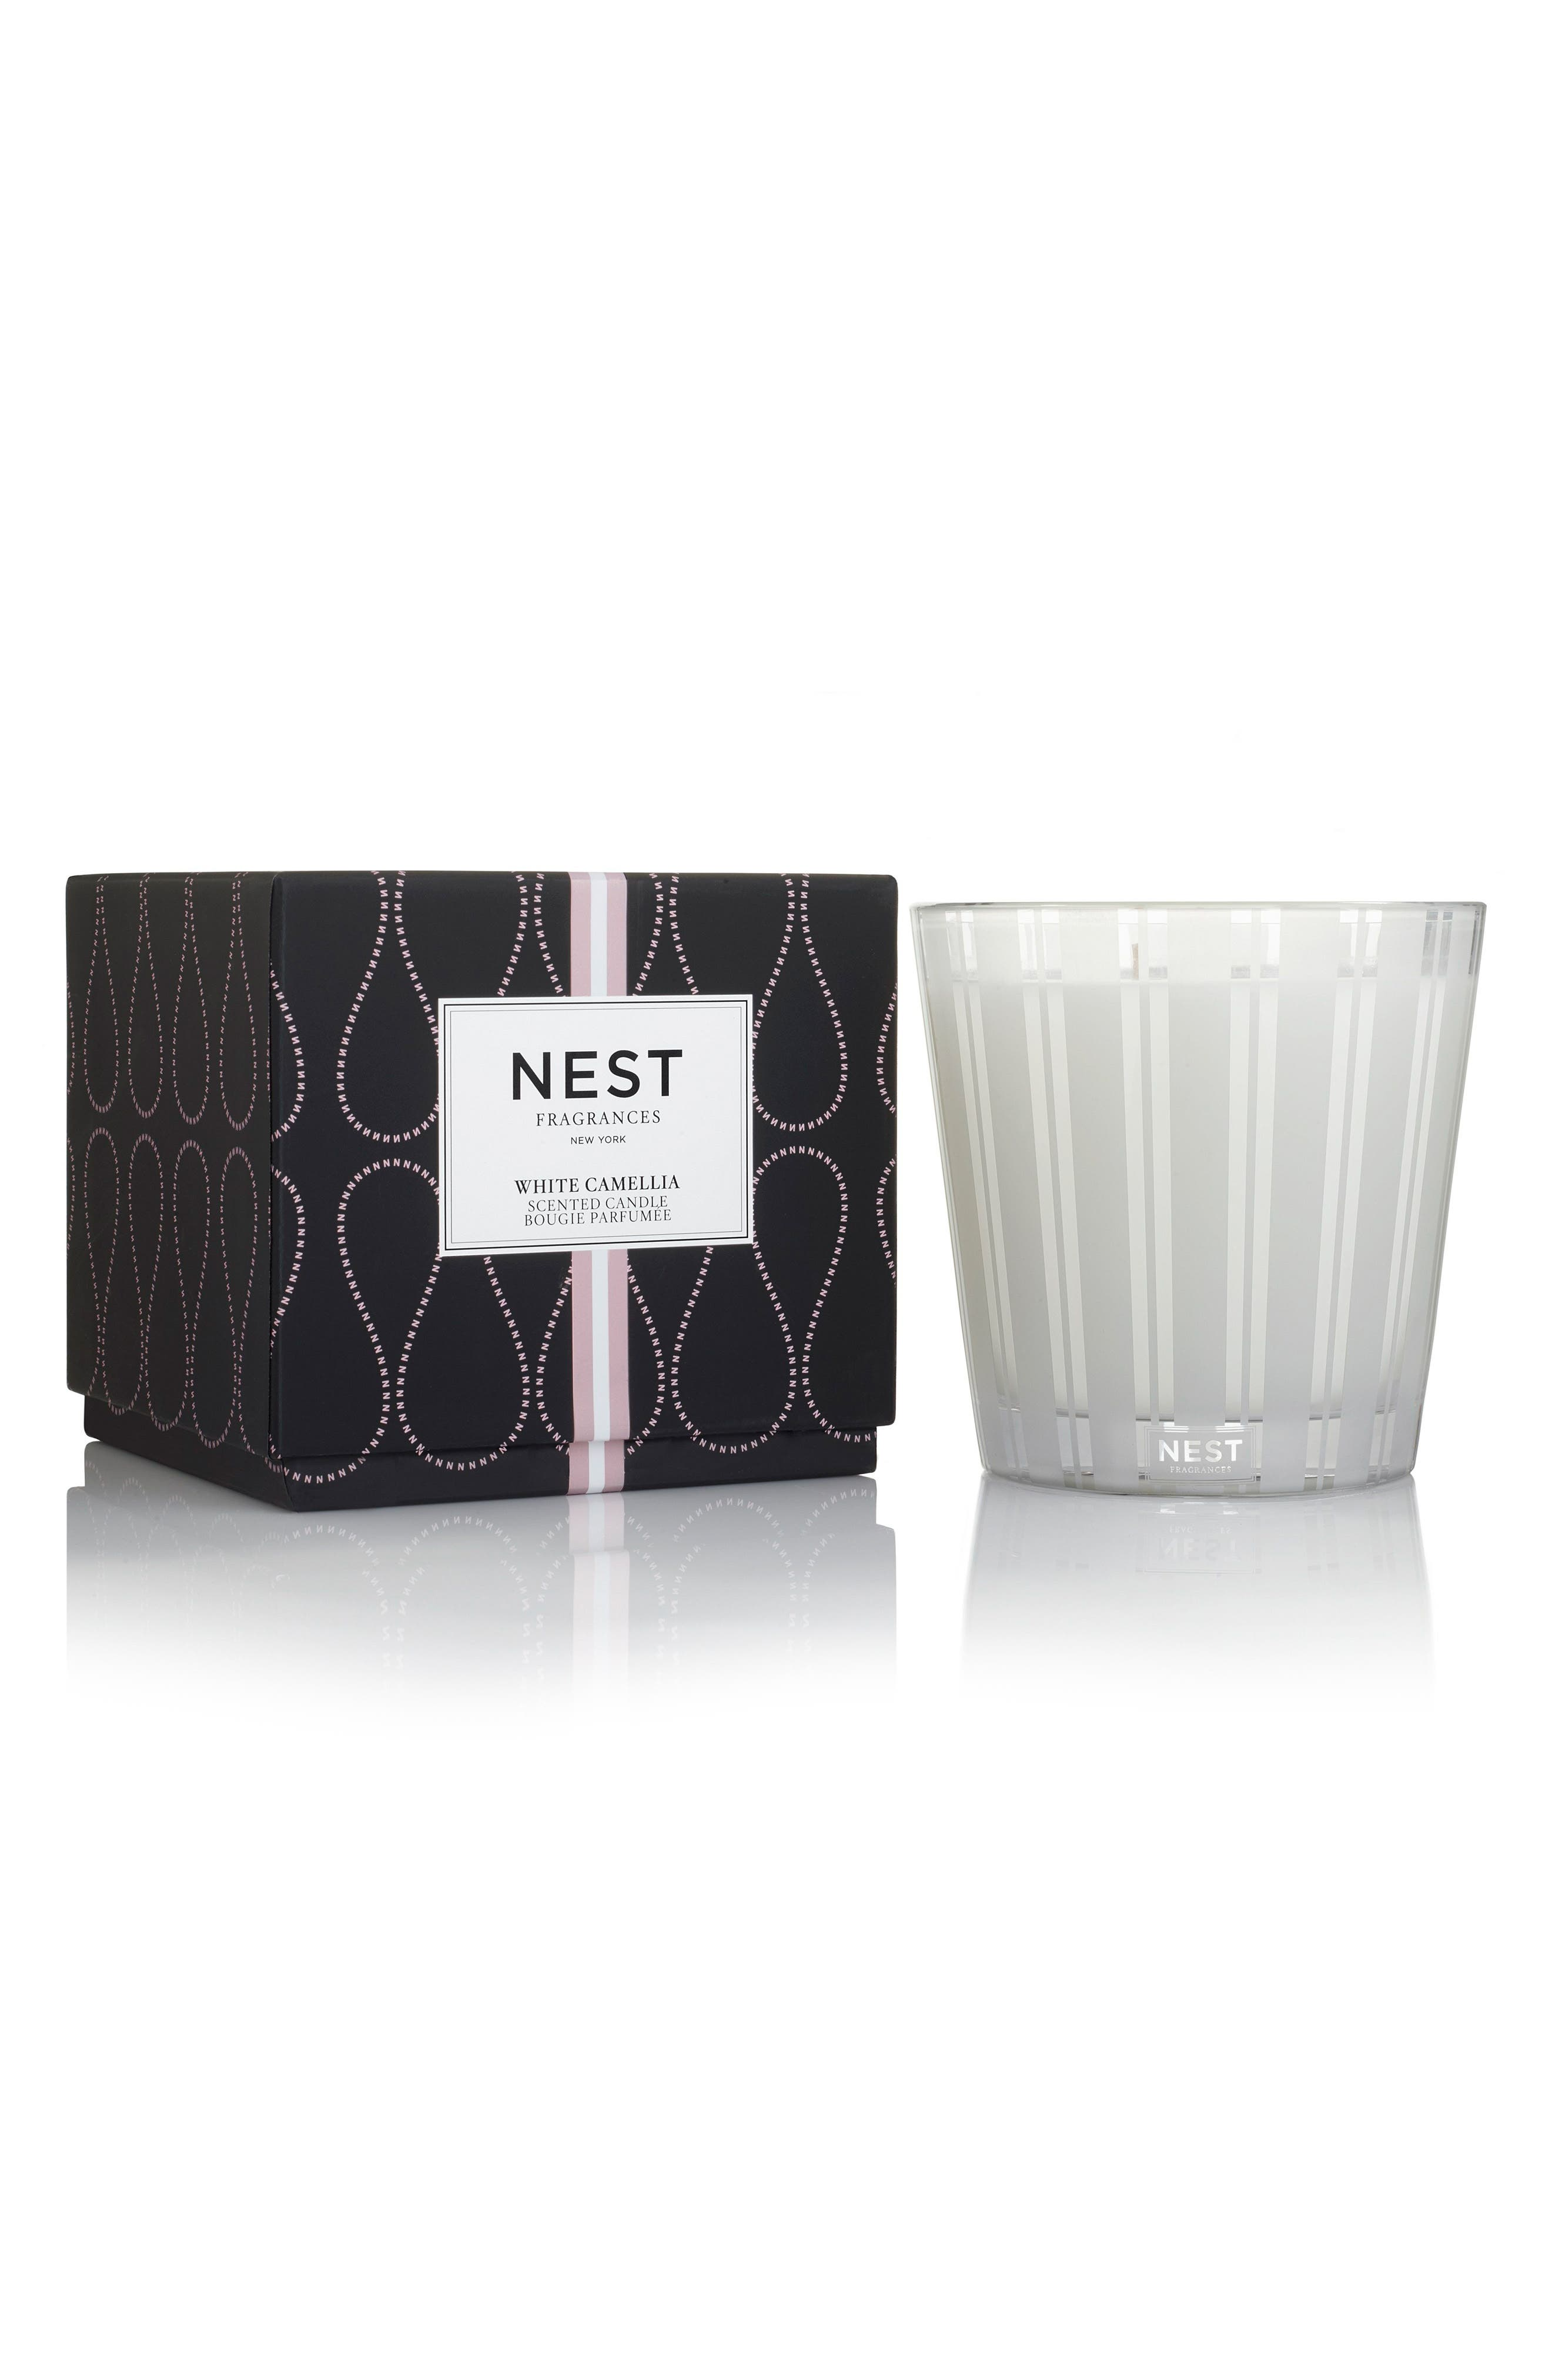 NEST Fragrances White Camellia Three-Wick Candle